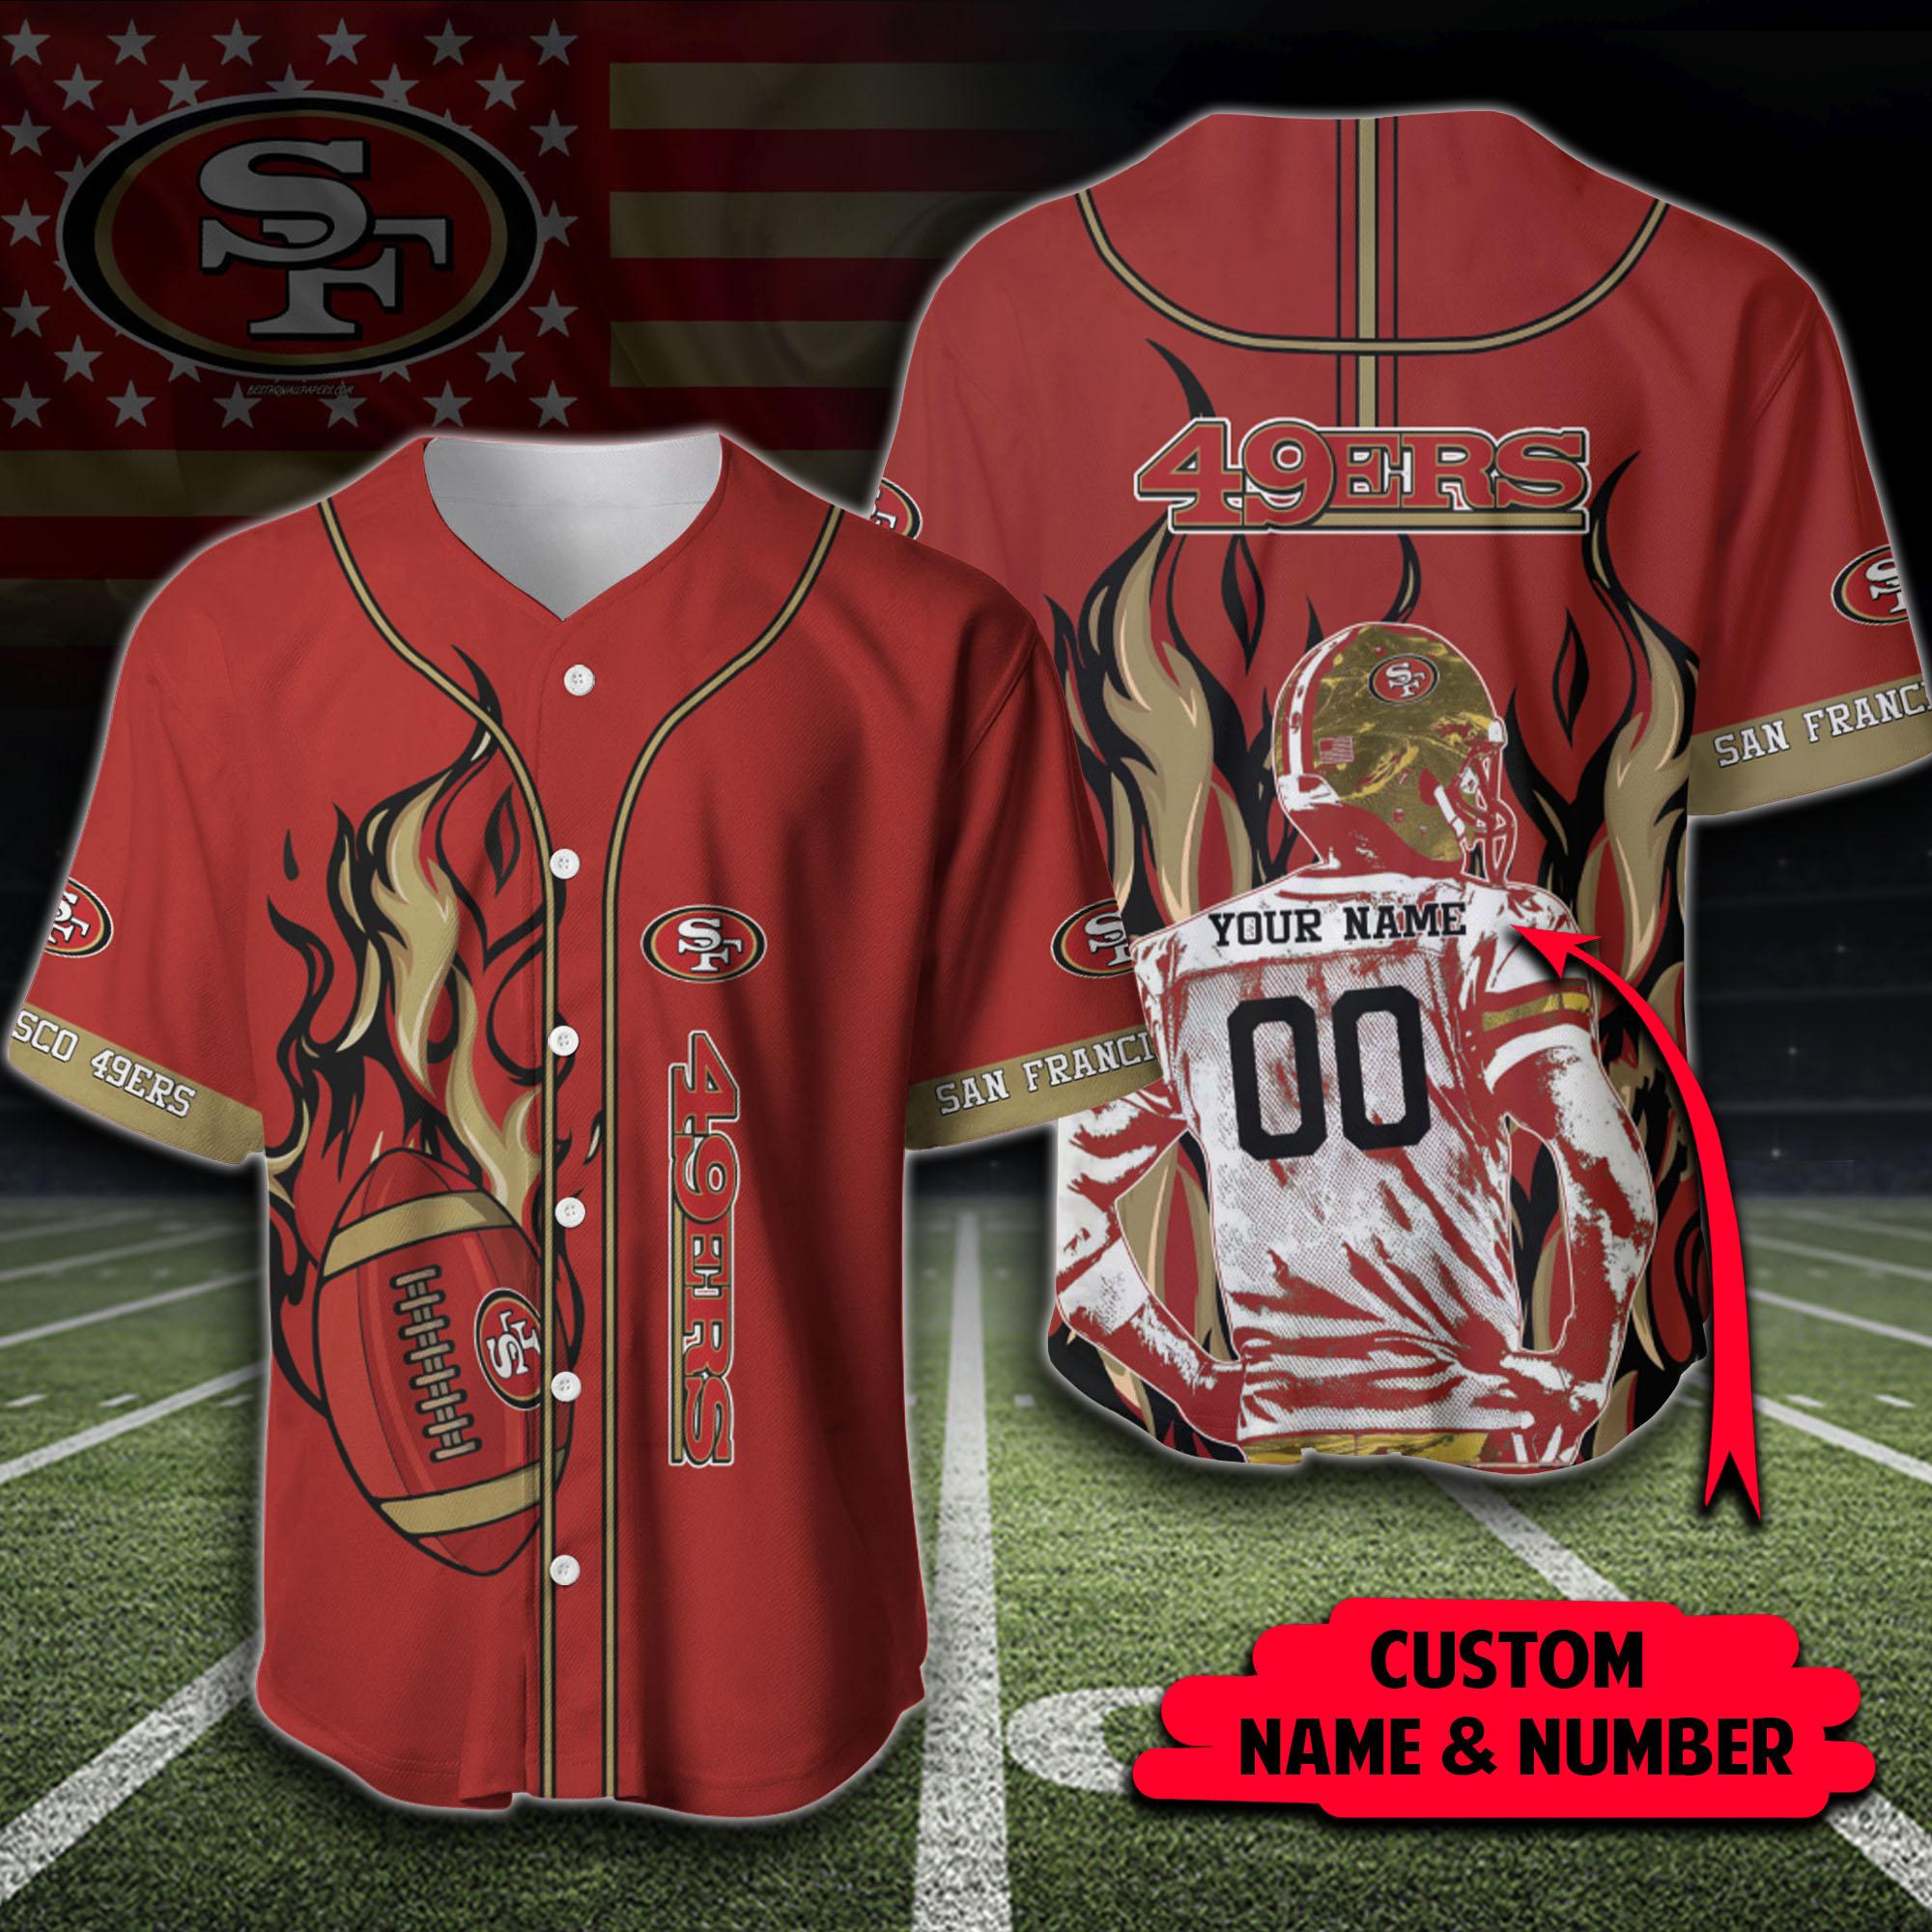 NFL San Francisco 49ers Custom Name And Number fireball baseball Jerseys shirt